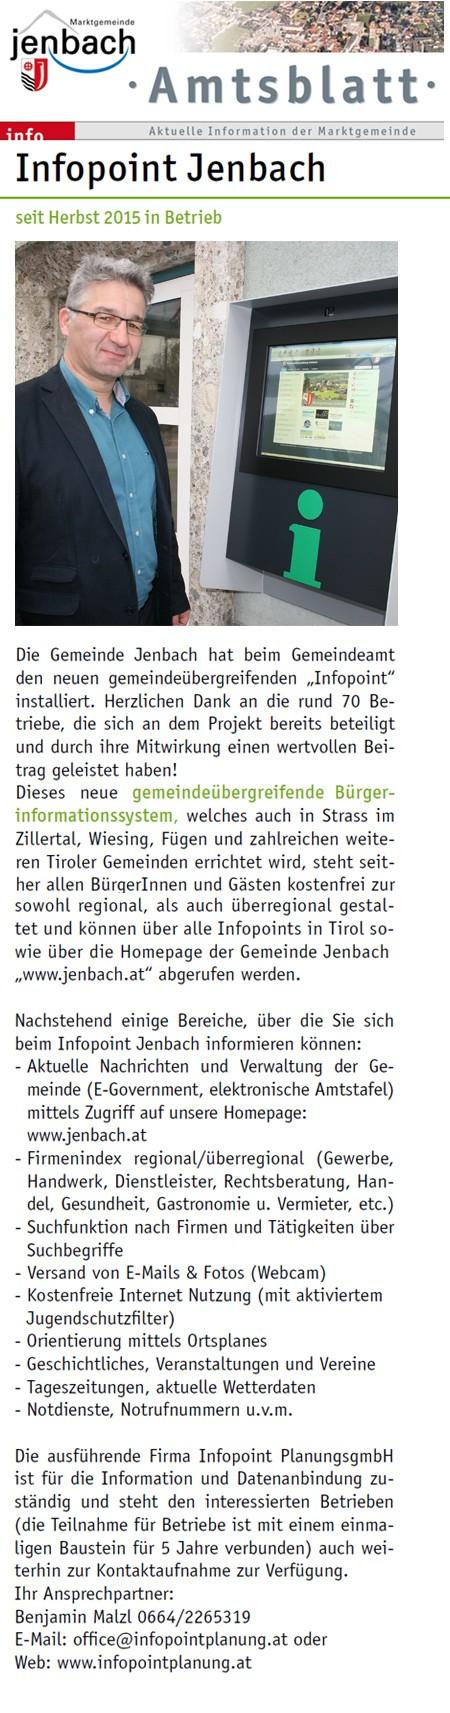 Inbetriebnahme Jenbach